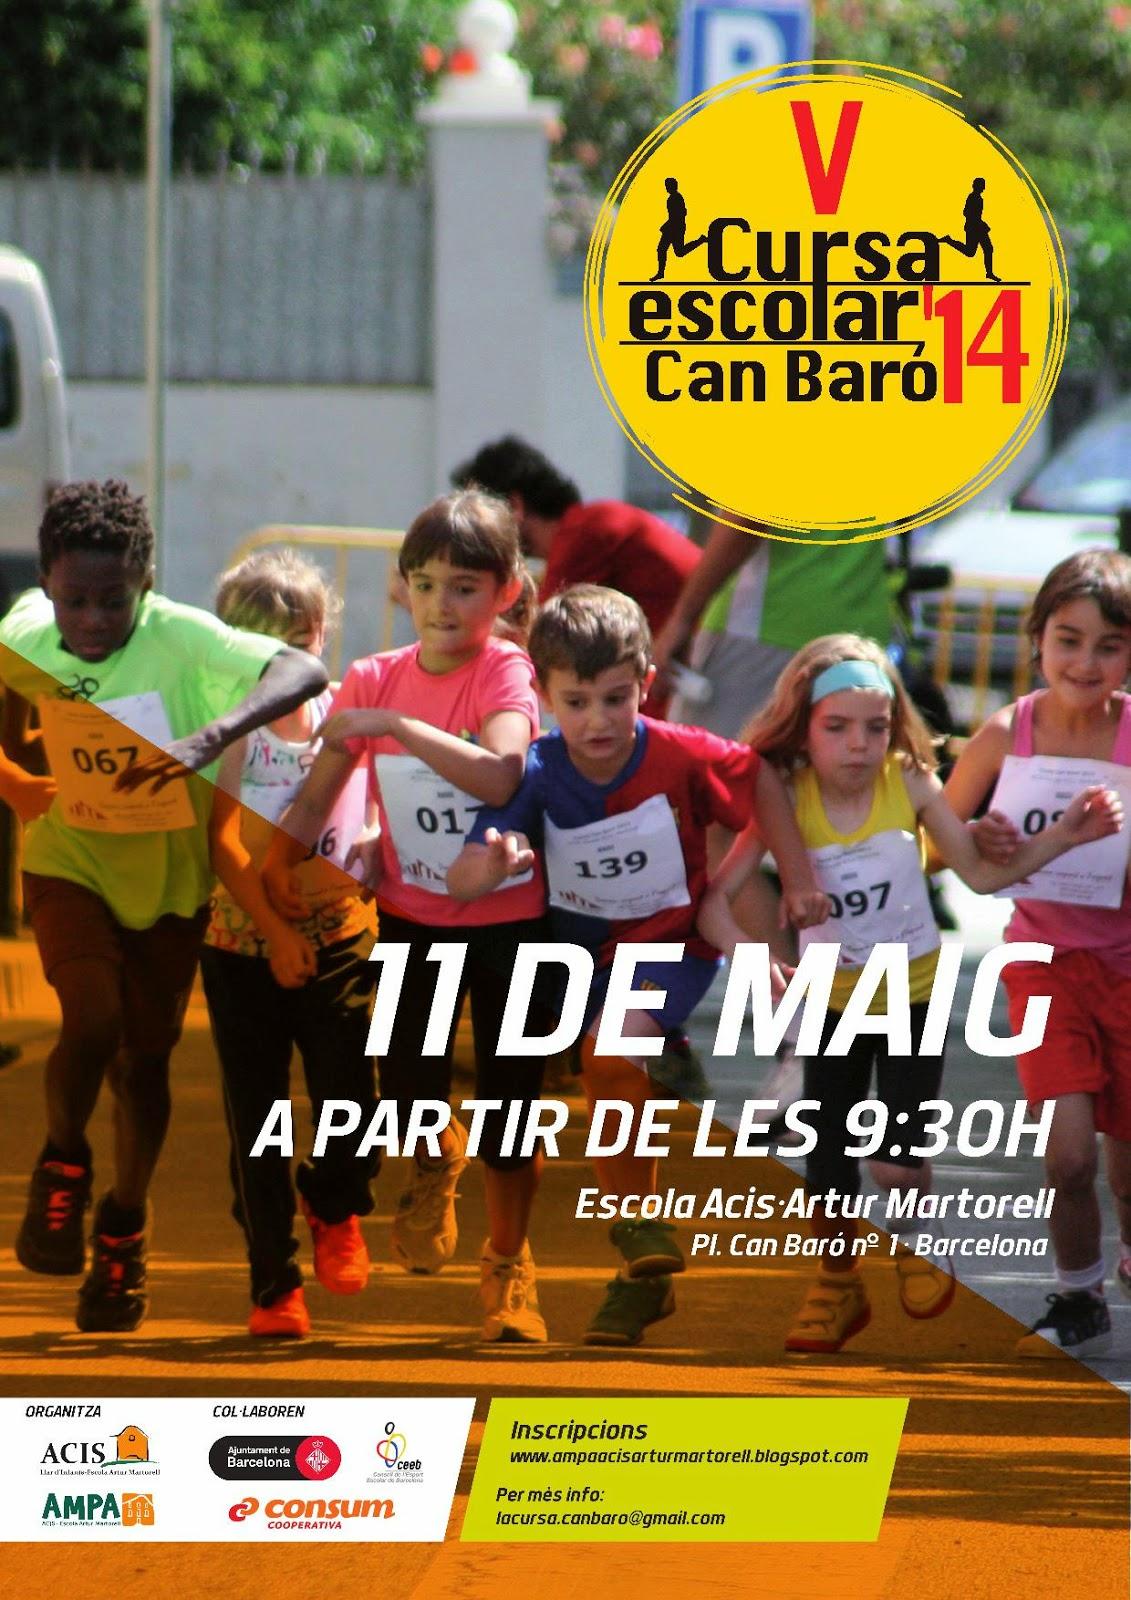 Cursa Can Baró 2014